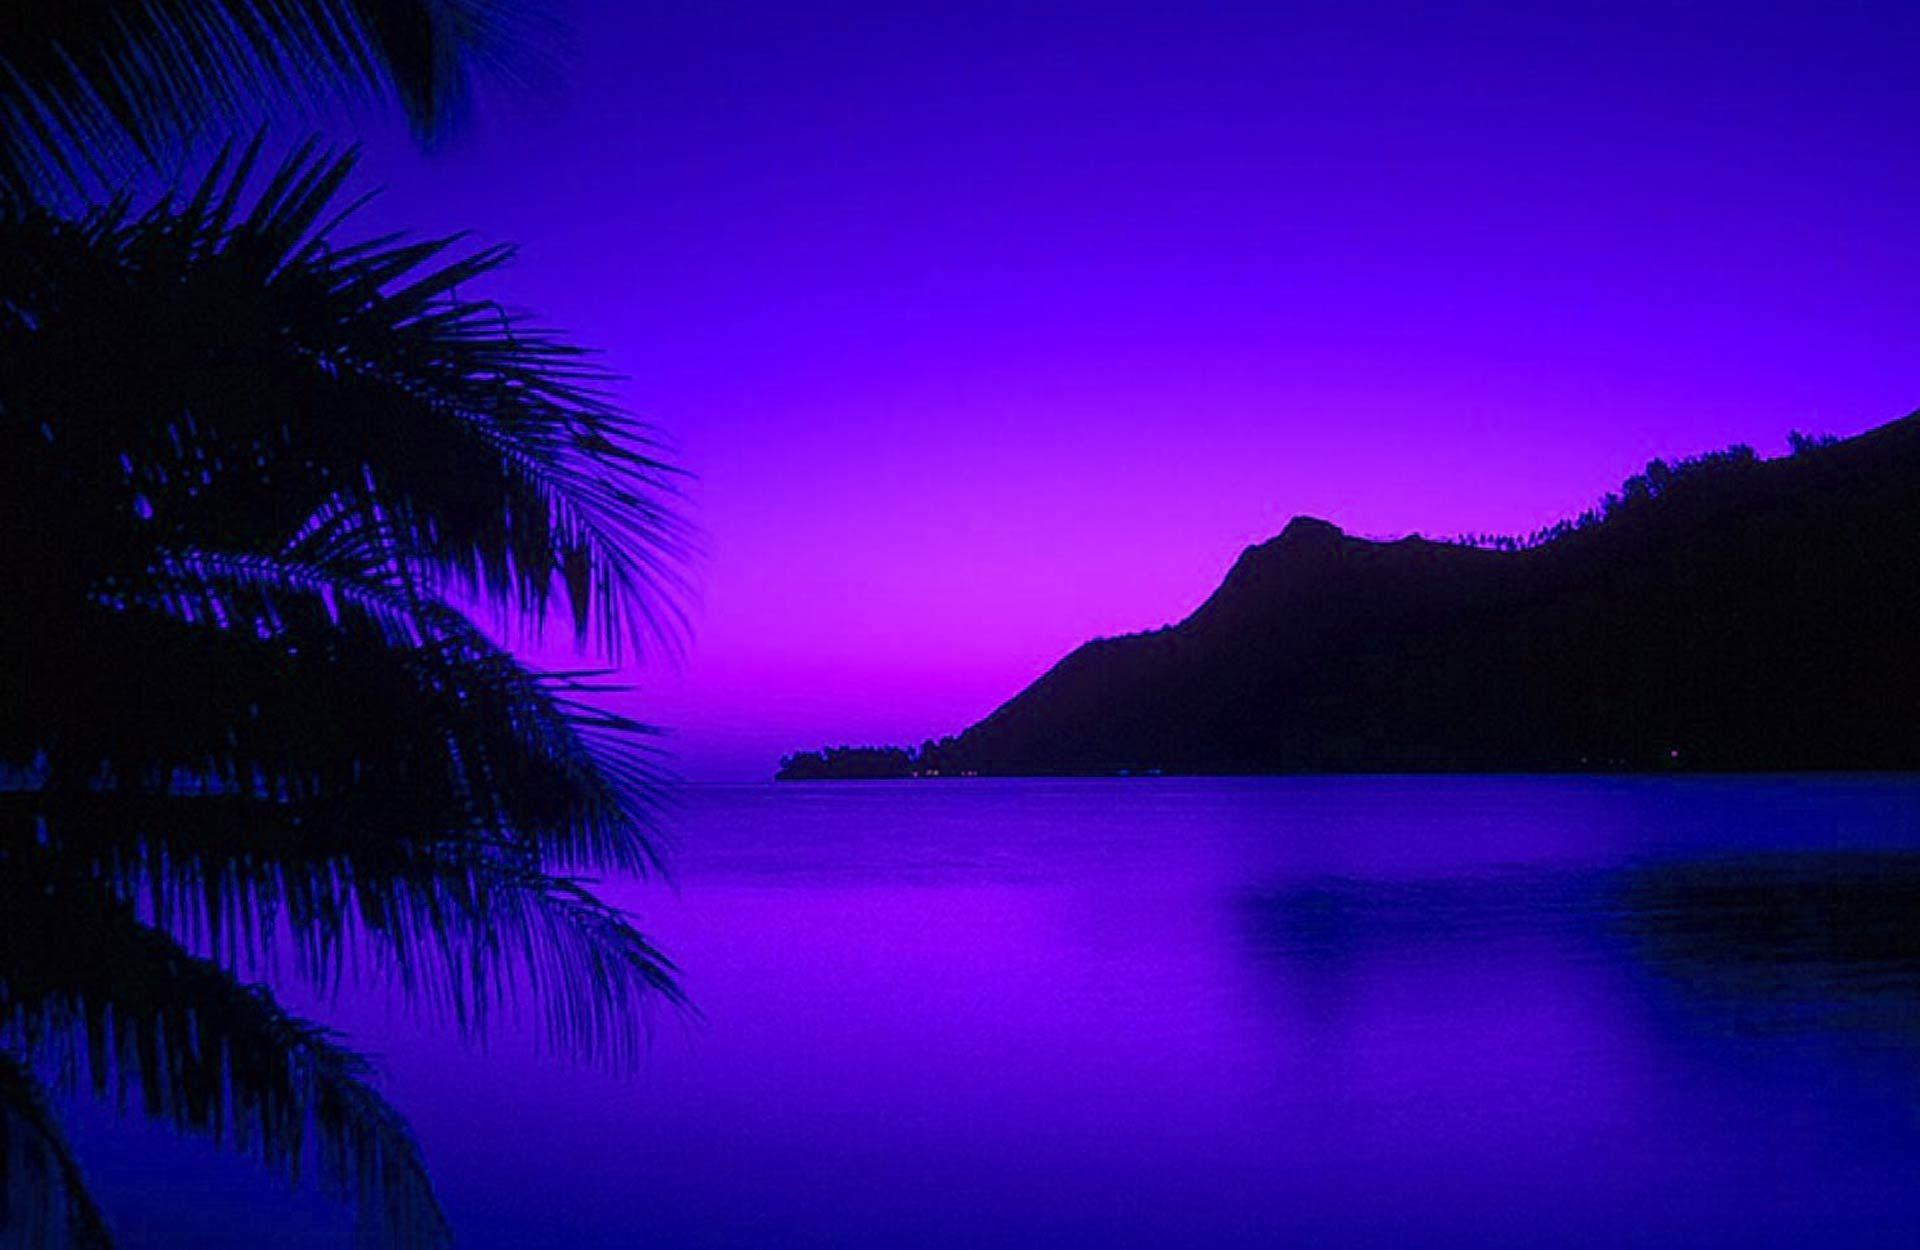 Fondos Paisajes De Verano Fondos Moviles Gratis 16 Hd Wallpapers Sunset Wallpaper Beautiful Sunset Sunset